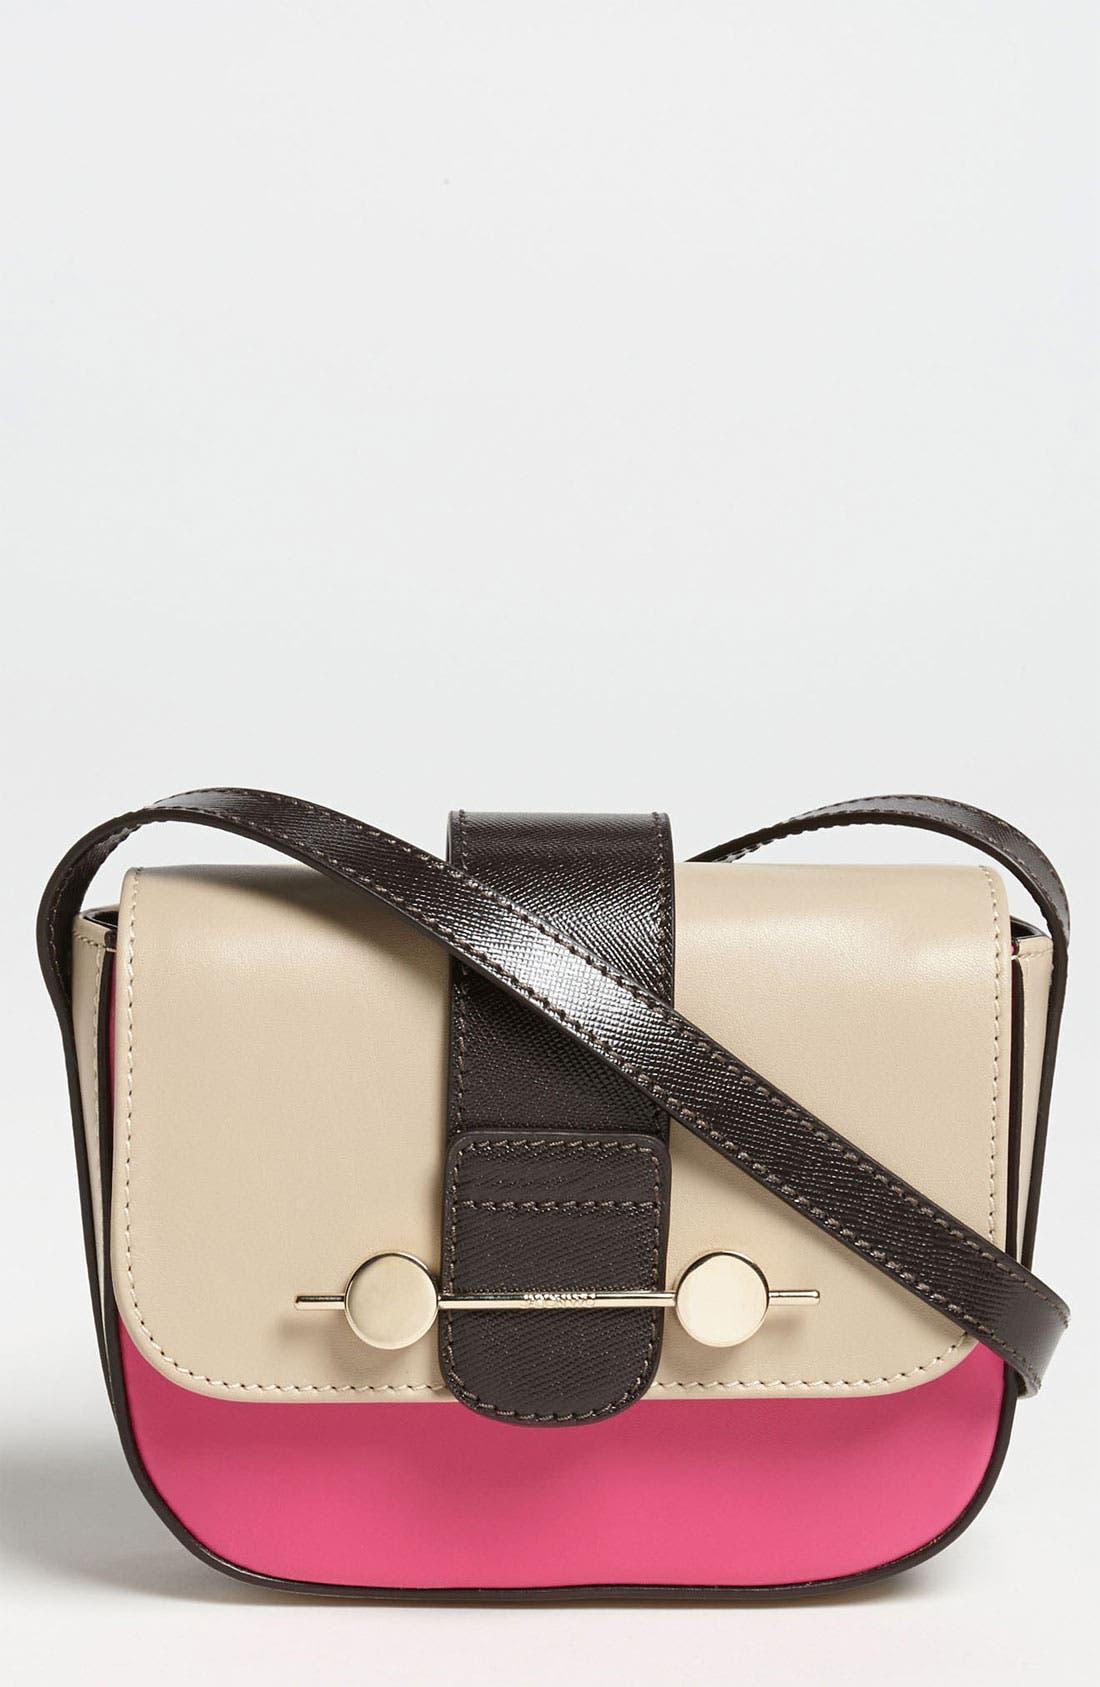 Alternate Image 1 Selected - Jason Wu 'Daphne - Mini' Crossbody Bag